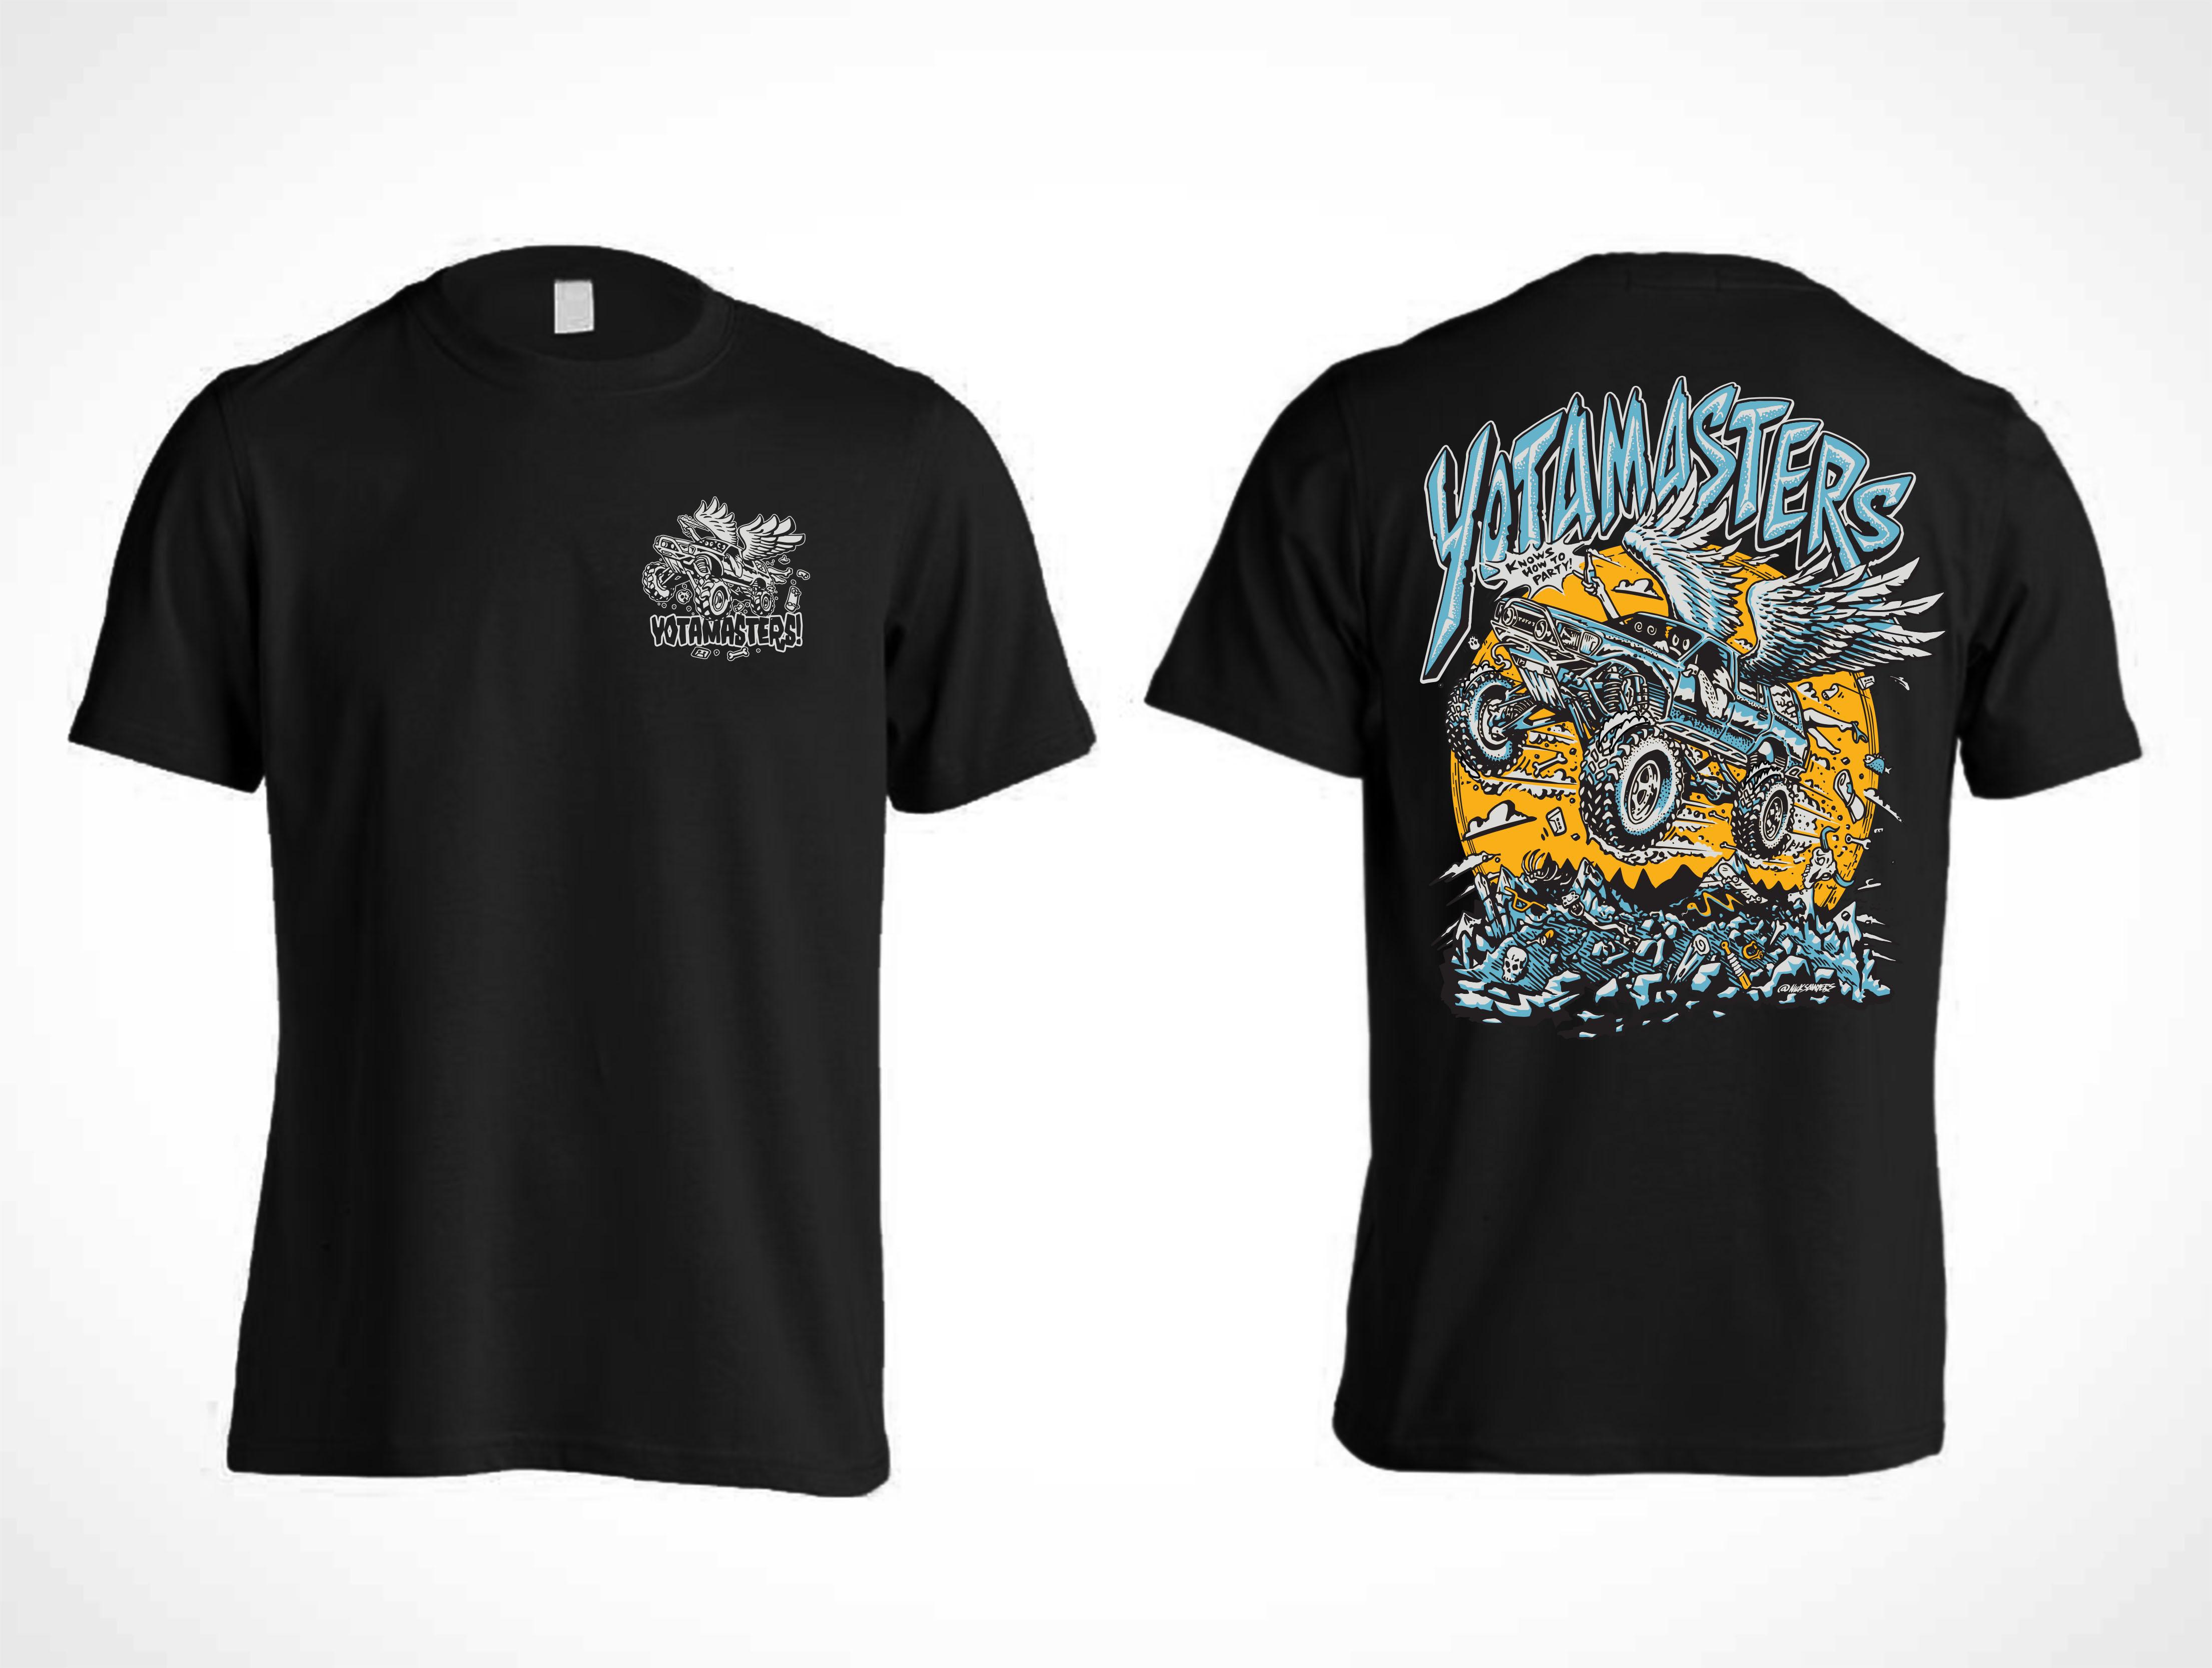 "Yotamasters ""Flying 4Runner"" T-Shirt"